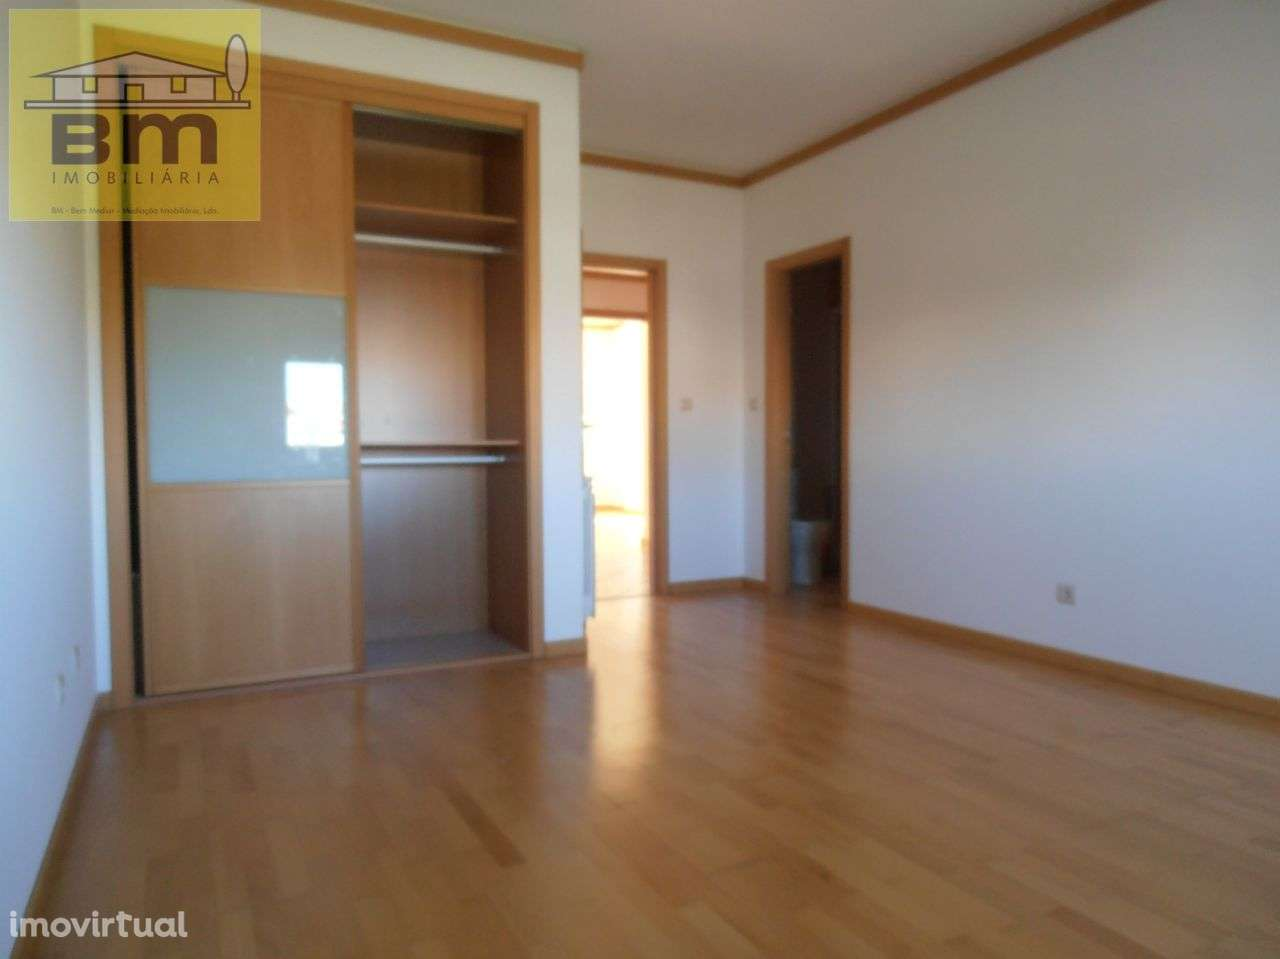 Apartamento para arrendar, Almaceda, Castelo Branco - Foto 11